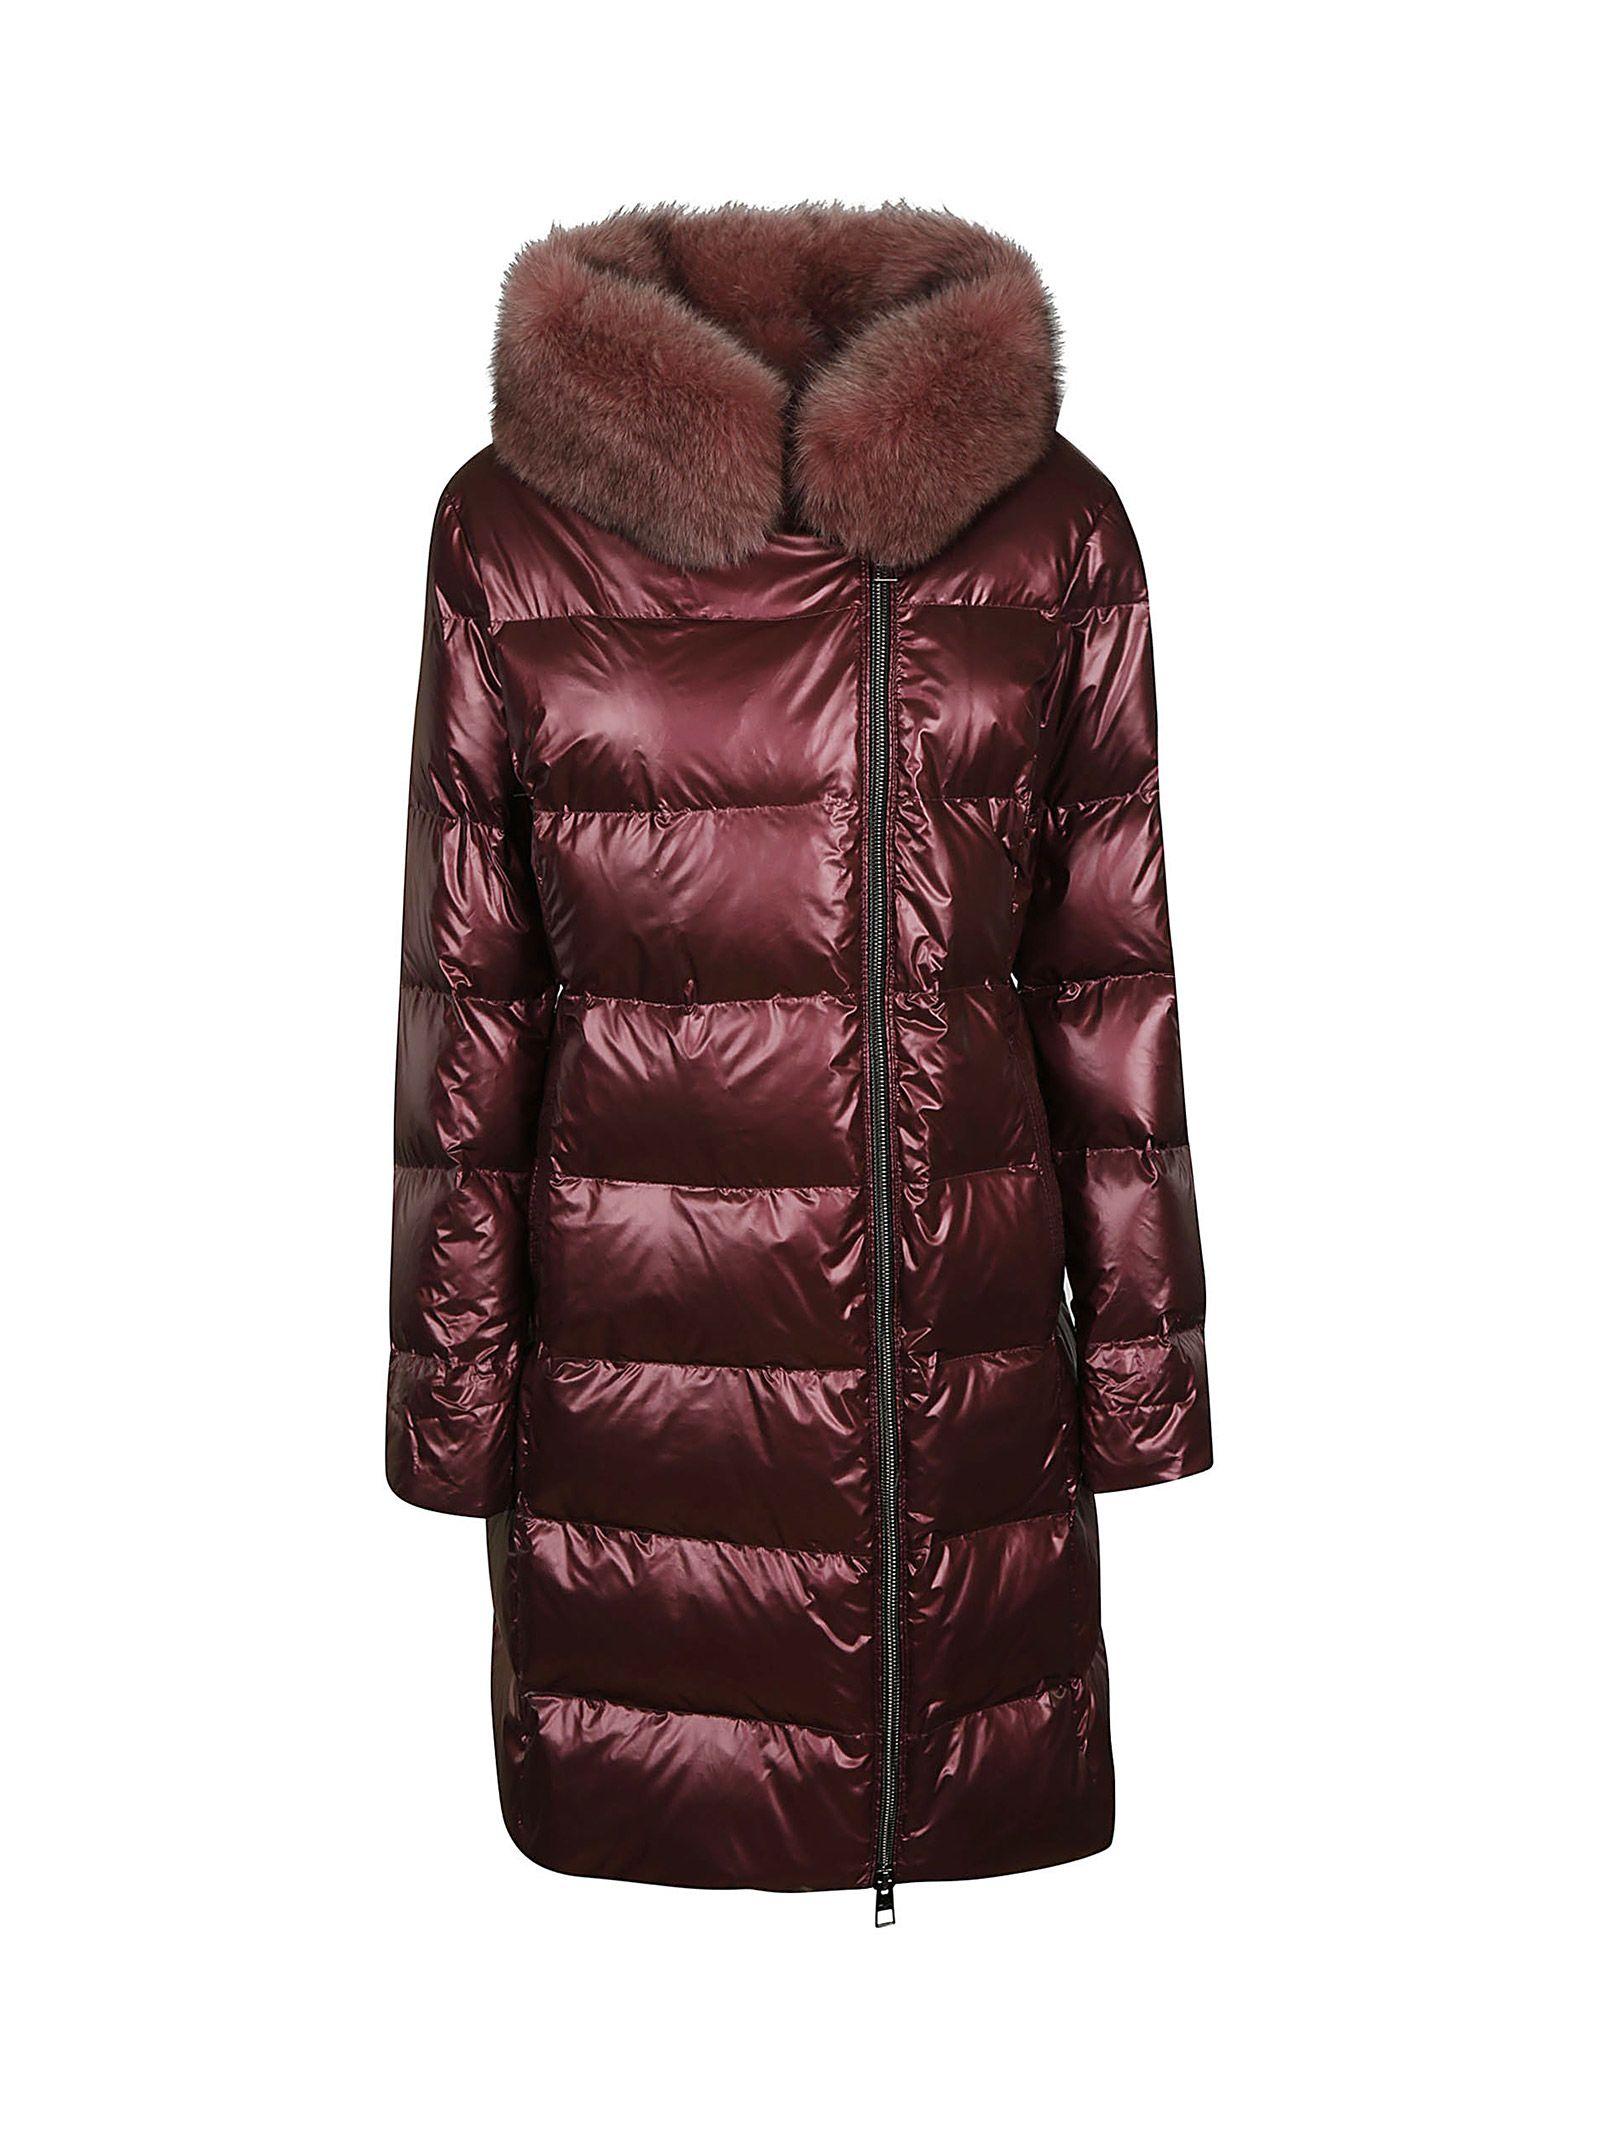 VIOLANTI Zip-Up Padded Jacket in Red